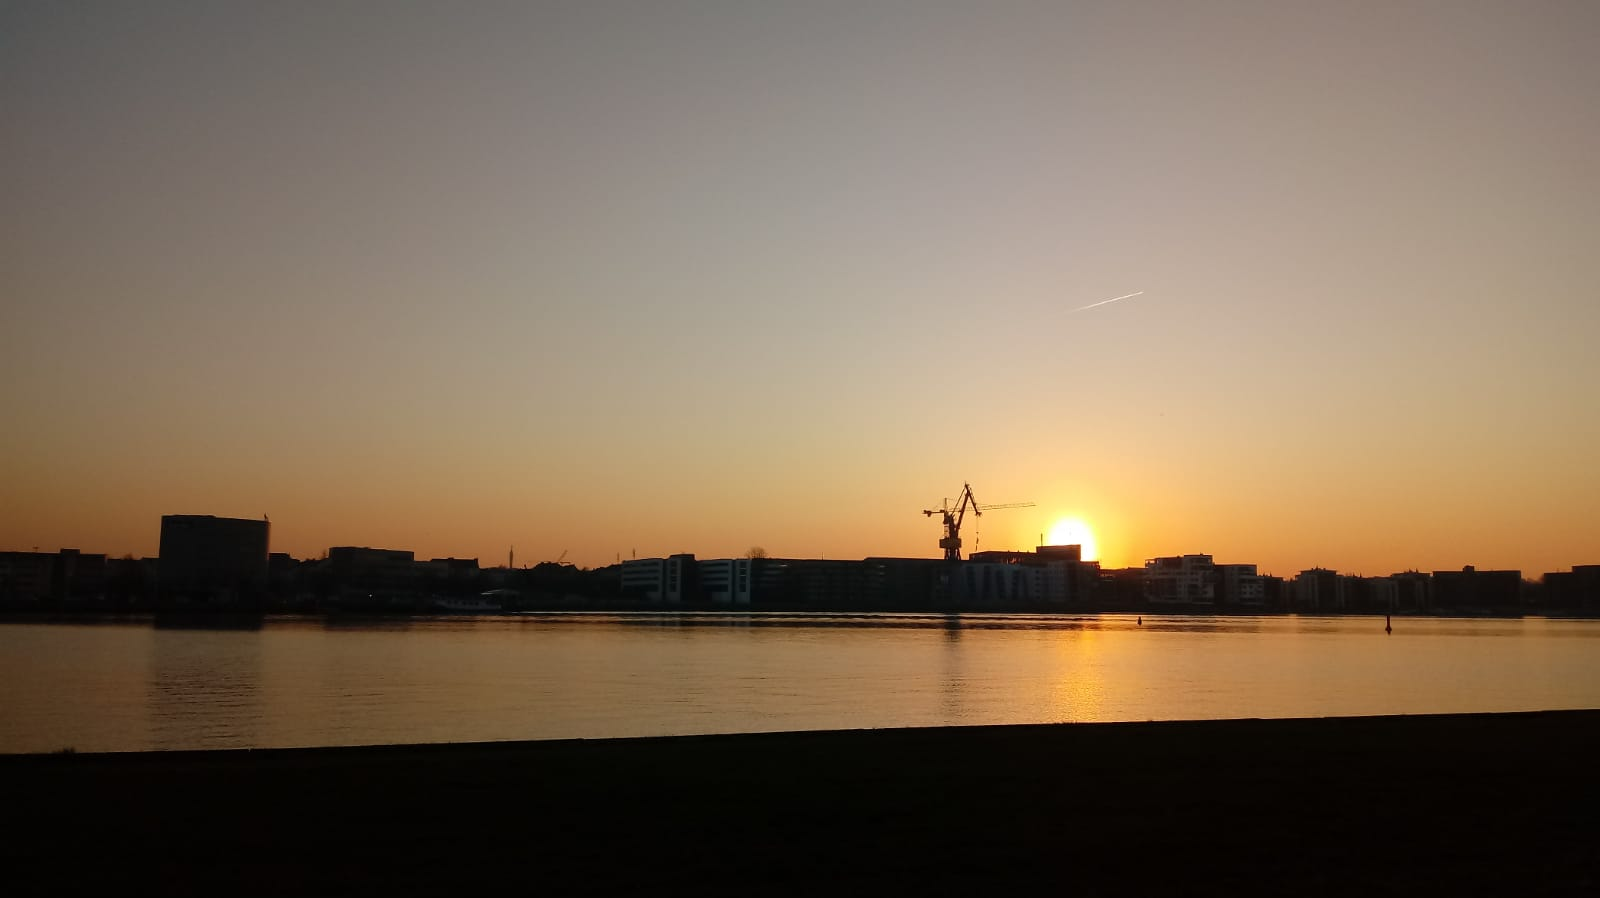 Sonnenuntergang Gehlsdorfer Ufer